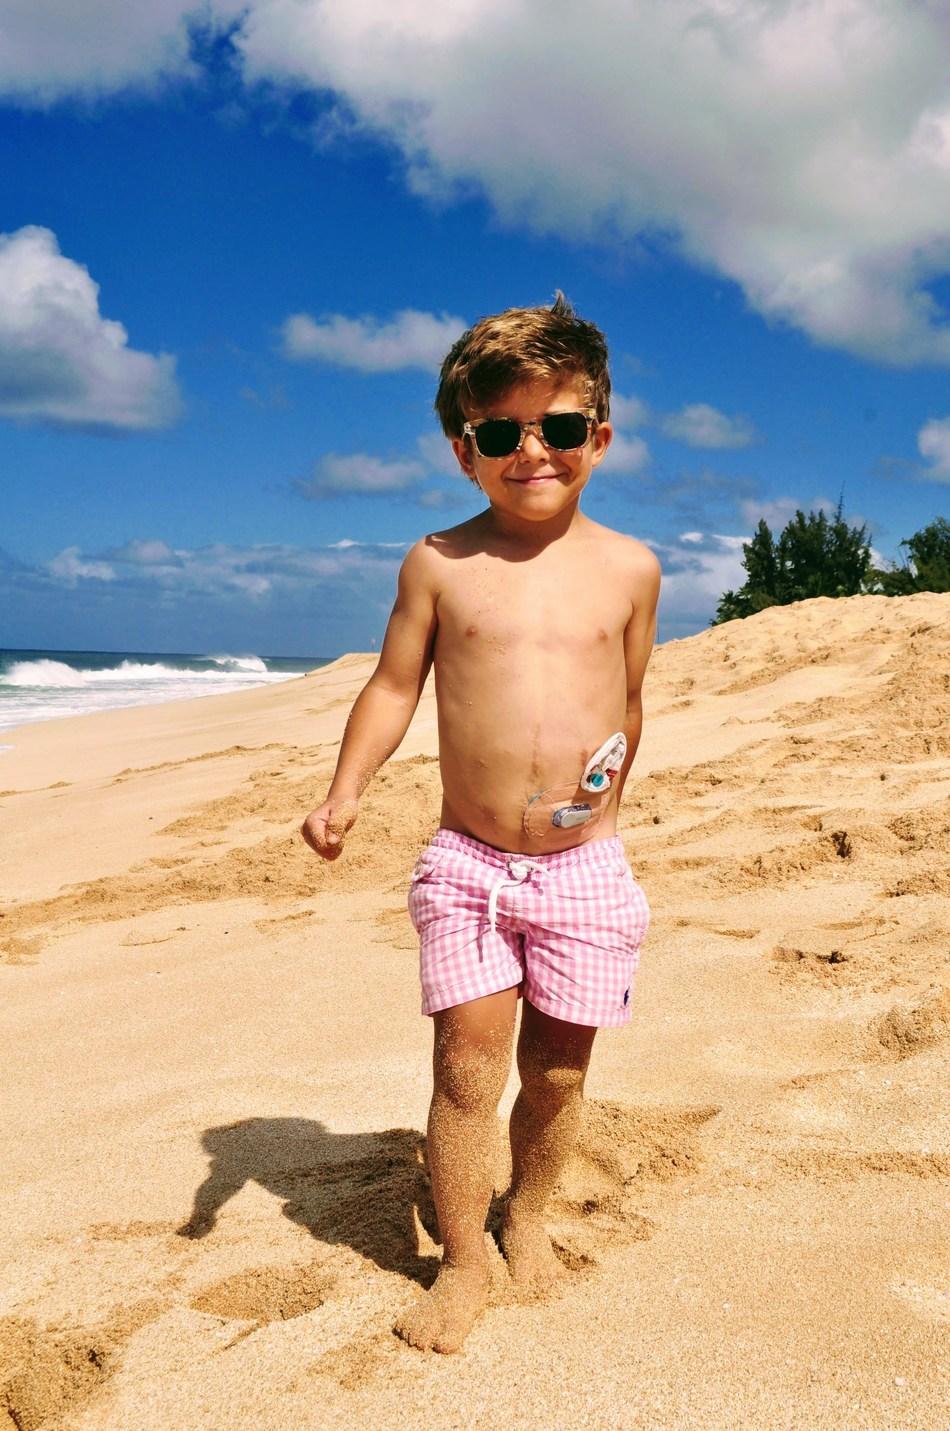 Wish Kid Maksim During His Transformational Make-A-Wish Trip to Hawaii